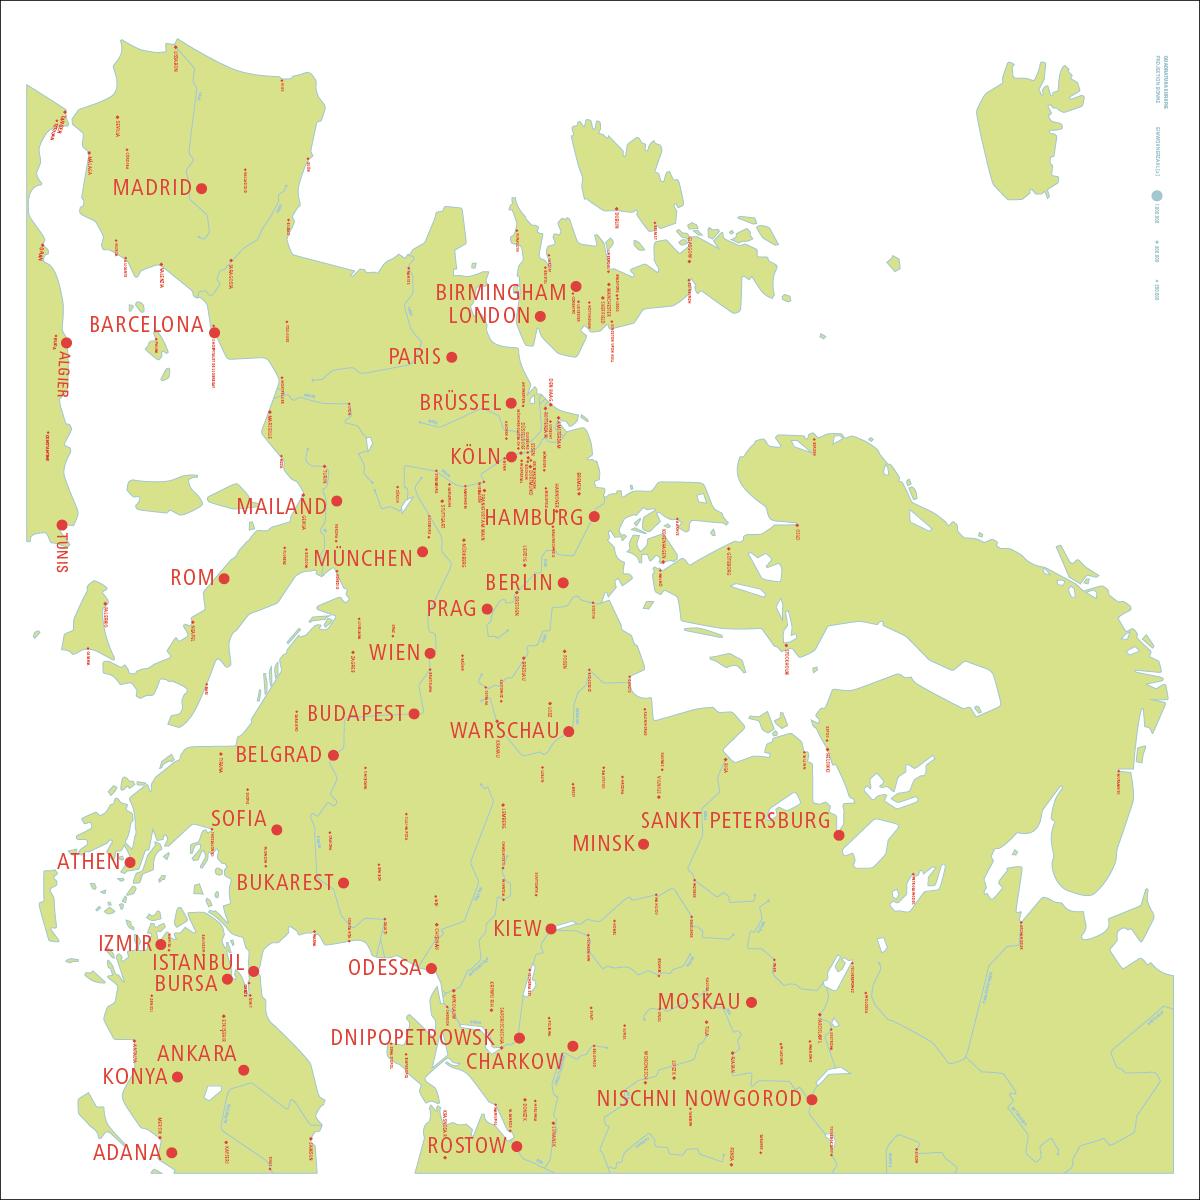 Uralgebirge Karte.Quadratura Europae 2015 Jo Krieg Designer